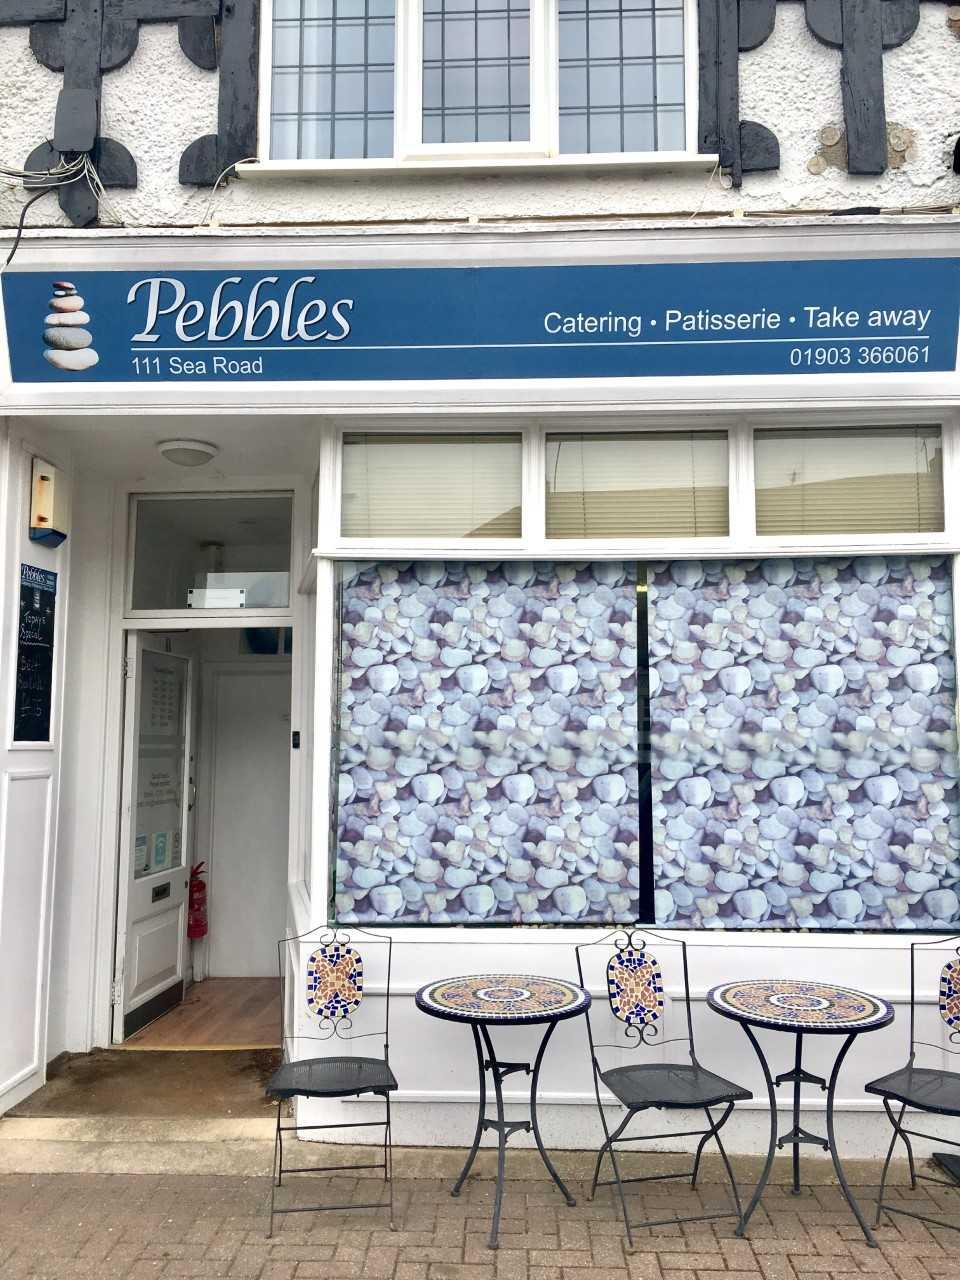 Pebbles in East Preston (1)